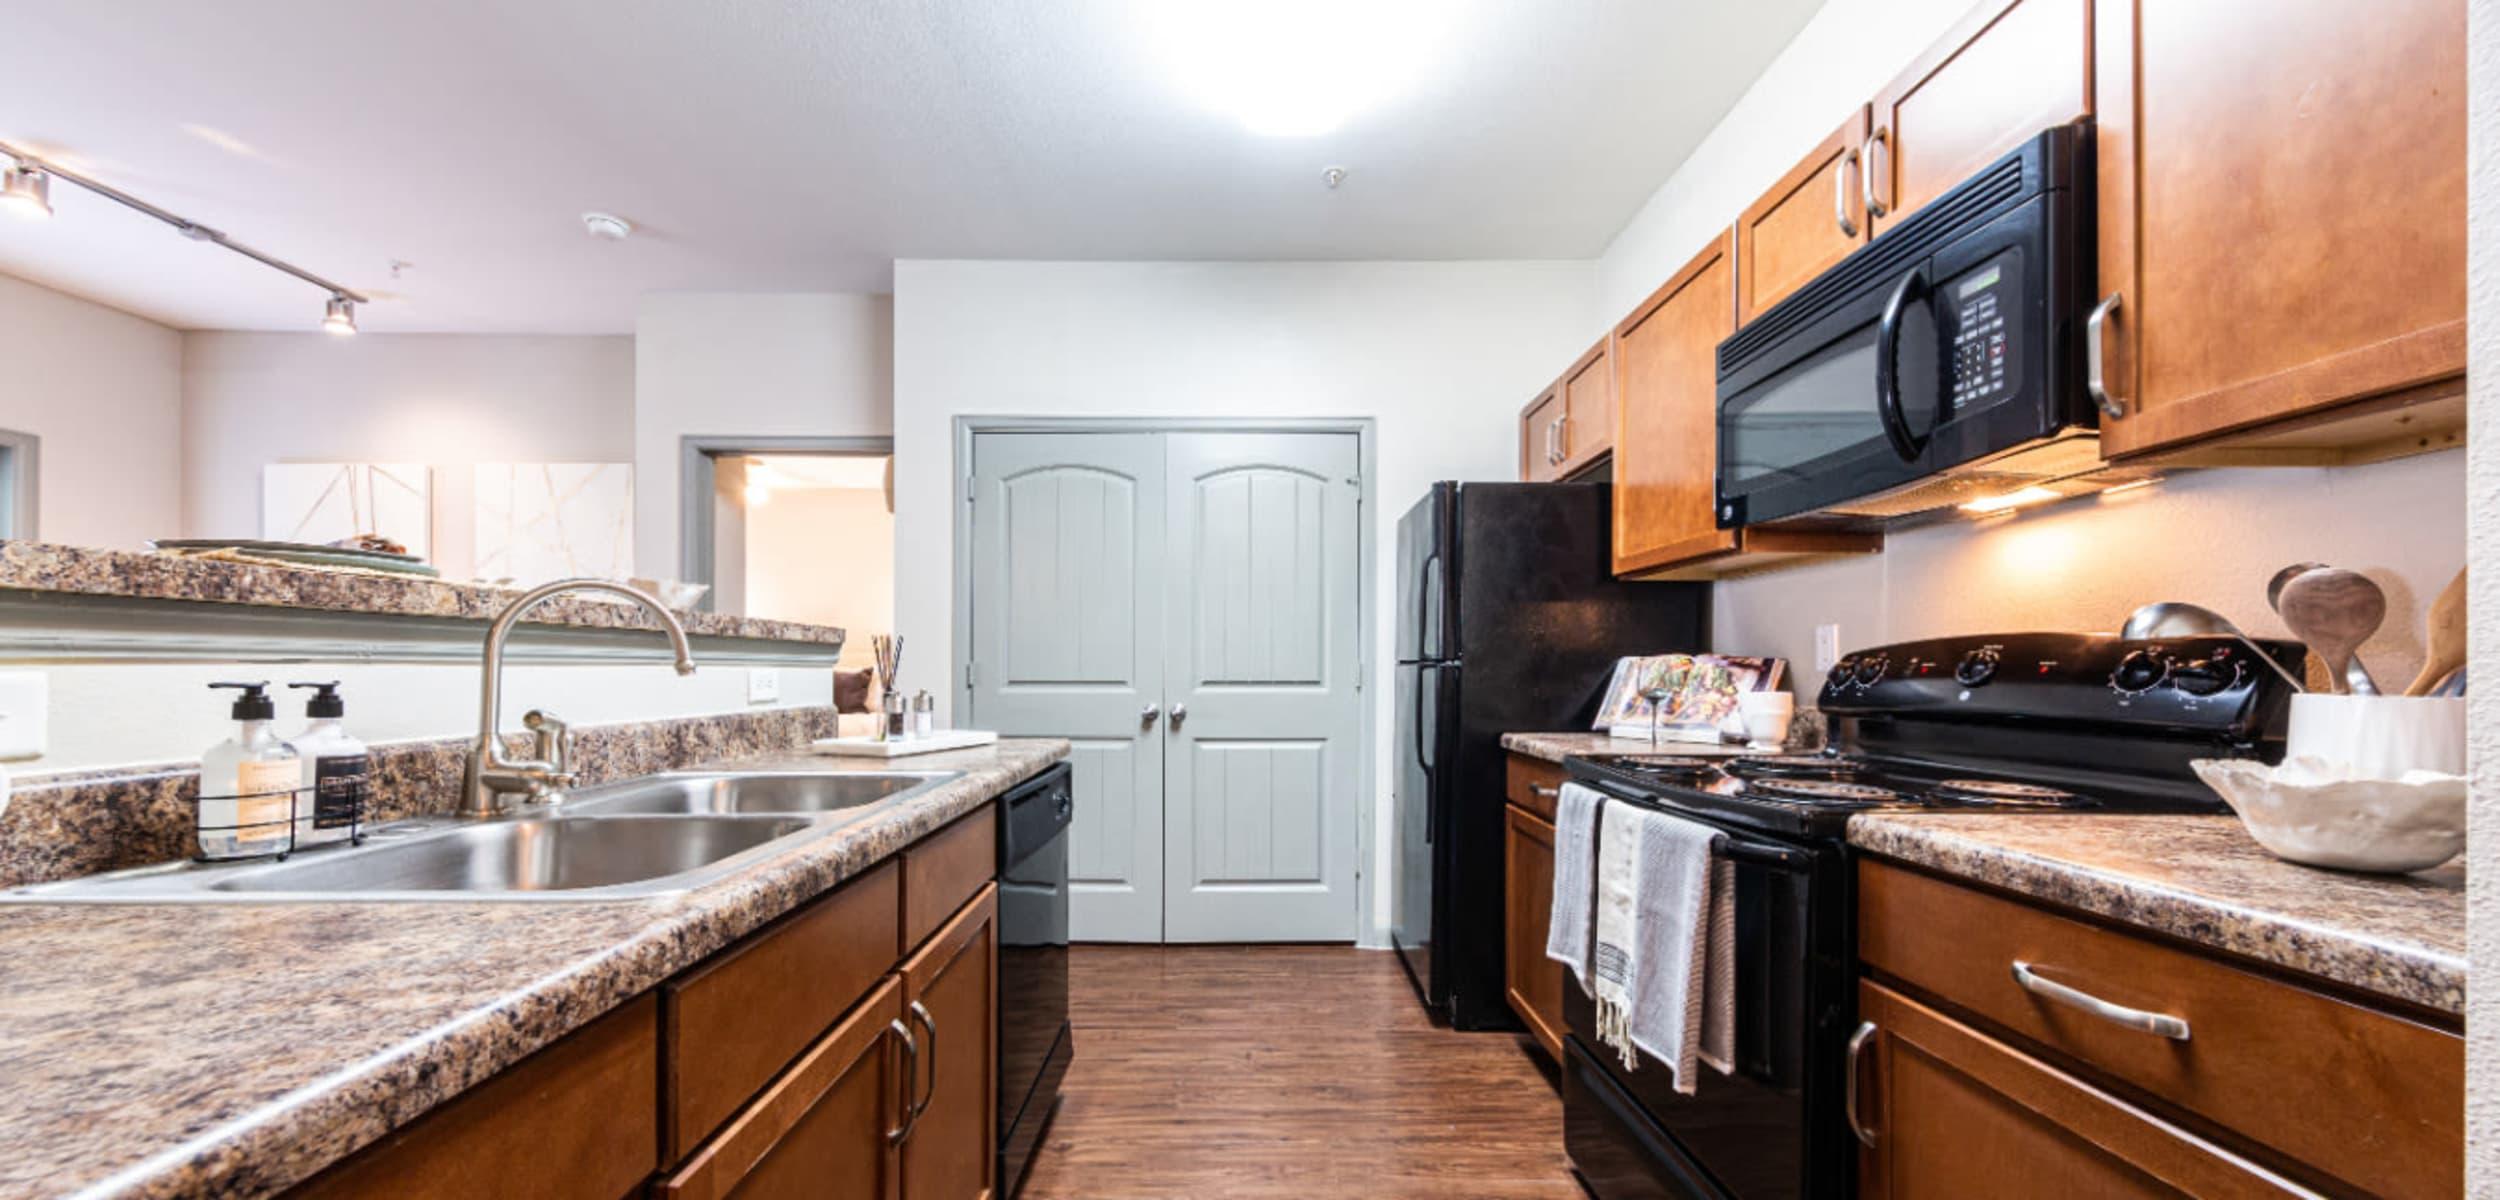 Modern, sleek kitchen at Marquis at Katy in Katy, Texas